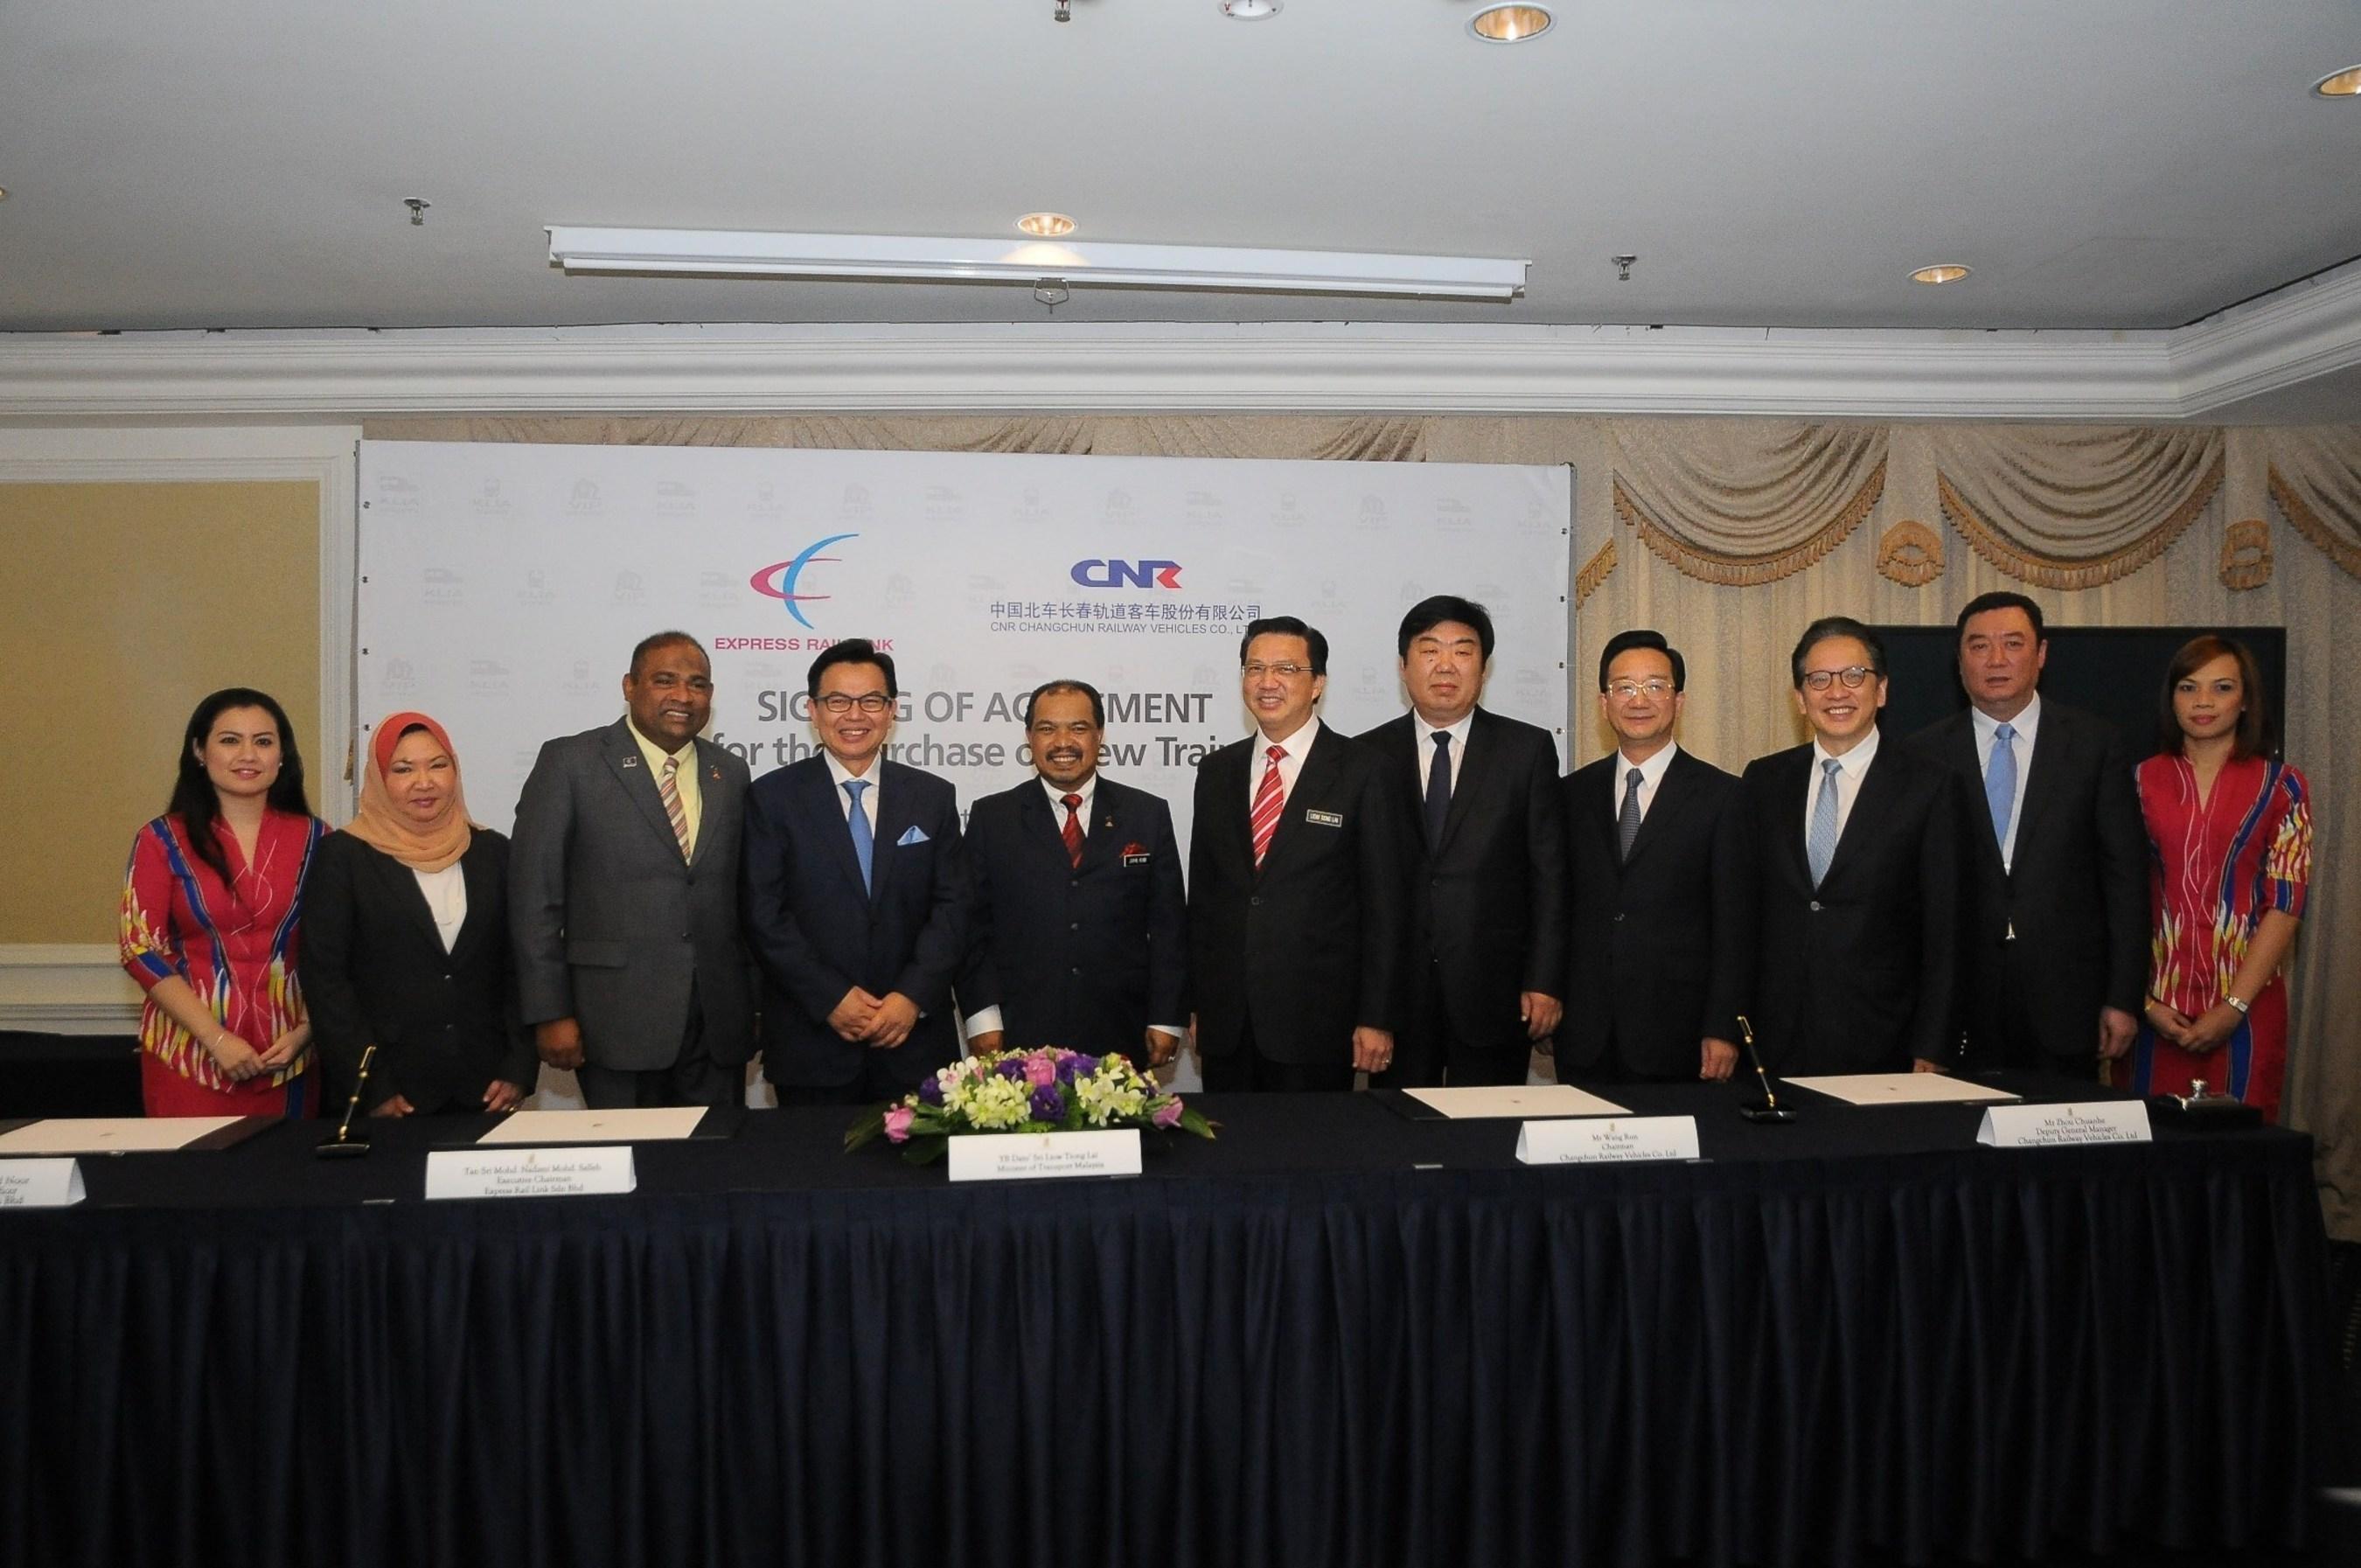 (from L-R) Pn Noormah Mohd Noor - ERL CEO, YB Datuk Seri Panglima Abdul Azeez Abdul Rahim - Chairman, Lembaga Tabung Haji, YBhg Tan Sri Mohd Nadzmi Mohd Salleh - Executive Chairman - ERL, YB Dato' Seri Jamil Khir Baharom - Minister in Prime Minister's Department, YB Dato' Sri Liow Tiong Lai - Minister of Transport, Mr Wang Run - Chairman CRC, His Excellency Huang Huikang - China Ambassador in Malaysia, YBhg Dato' Yeoh Seok Hong - Executive Director, YTL Corporation Berhad and Mr Zhou Chuanhe - Deputy General Manager/GM for Overseas Sales, CRC.